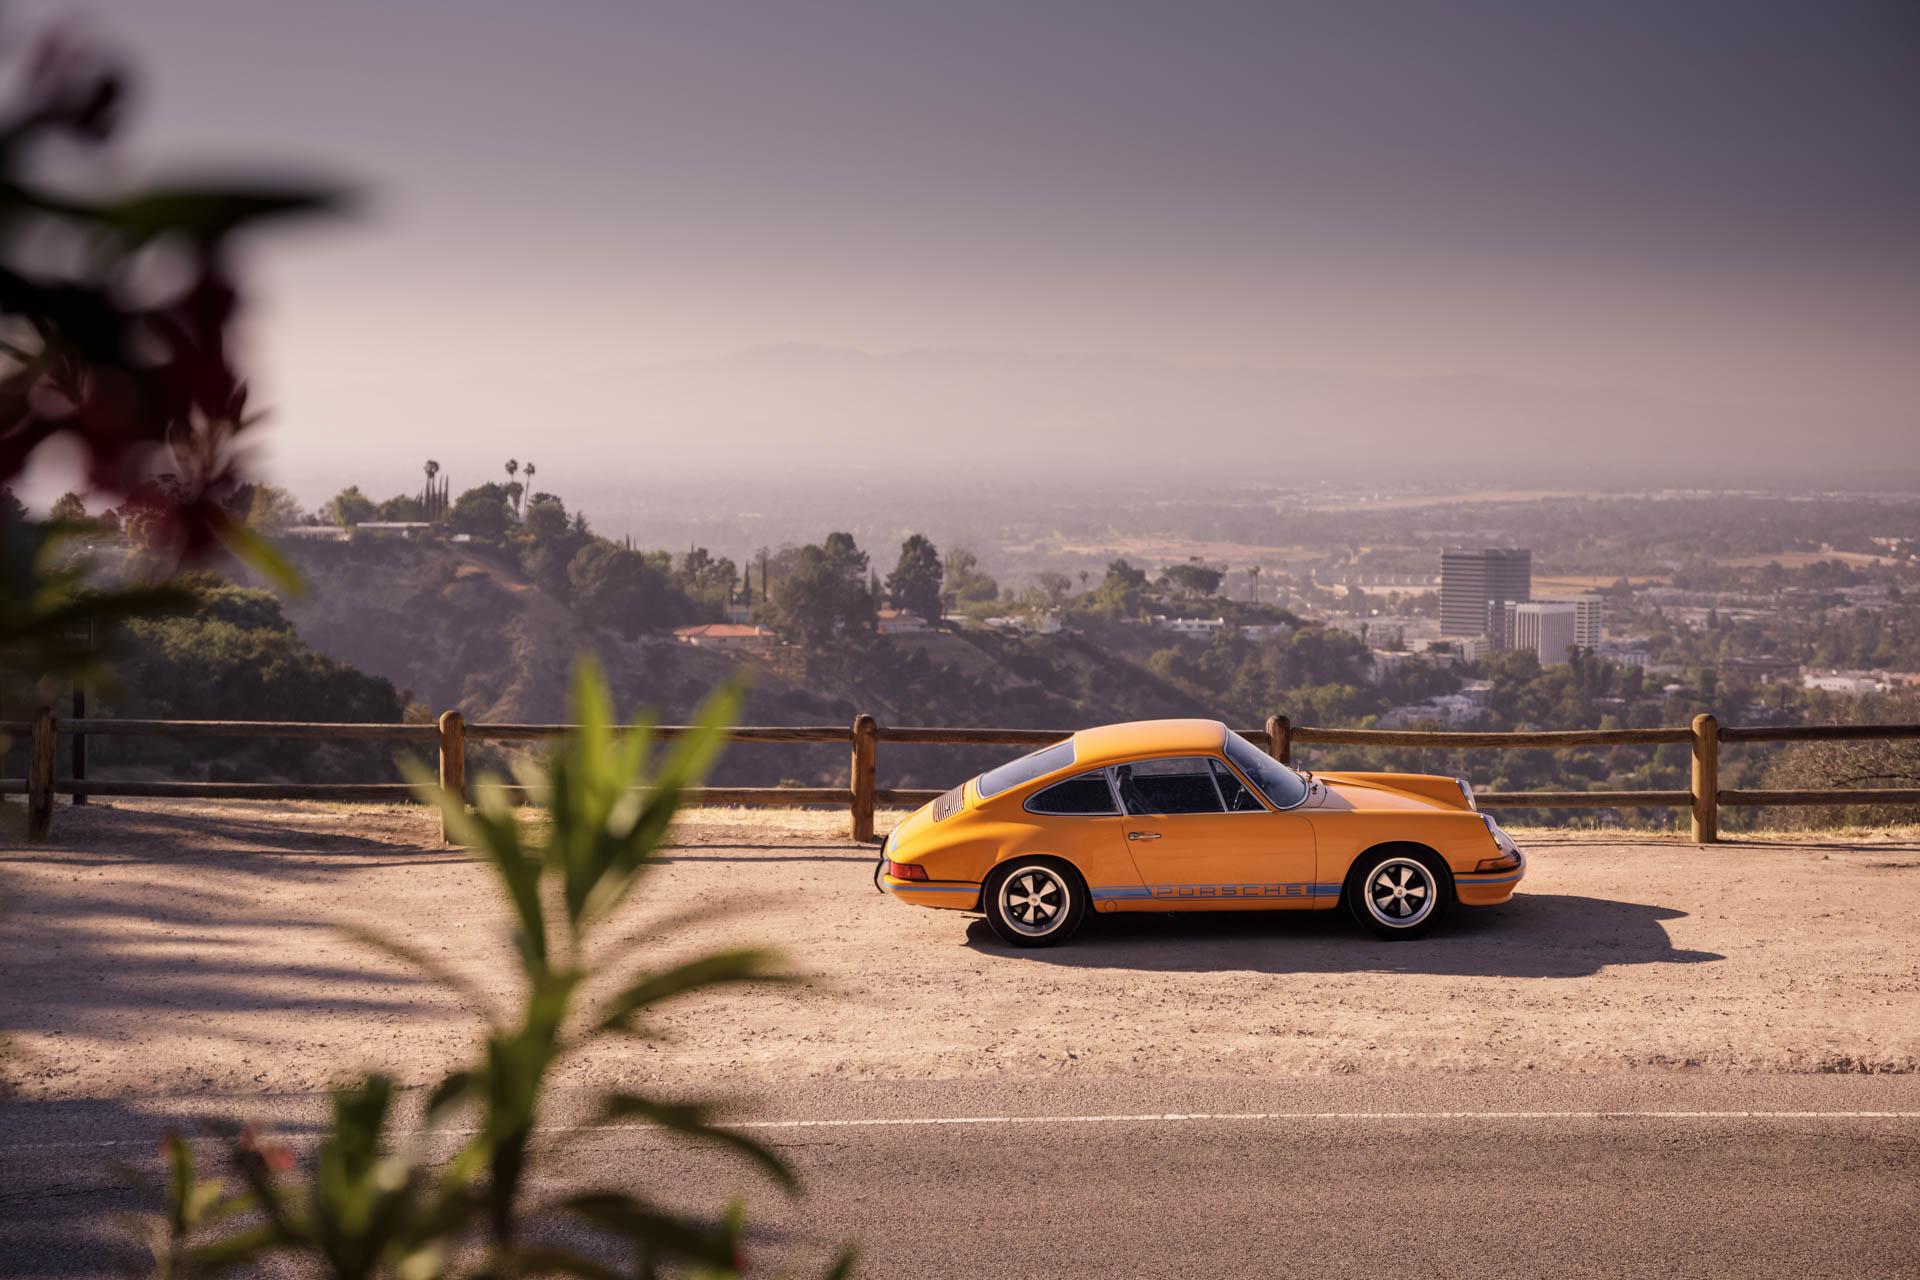 Porsche 911 in Los Angeles